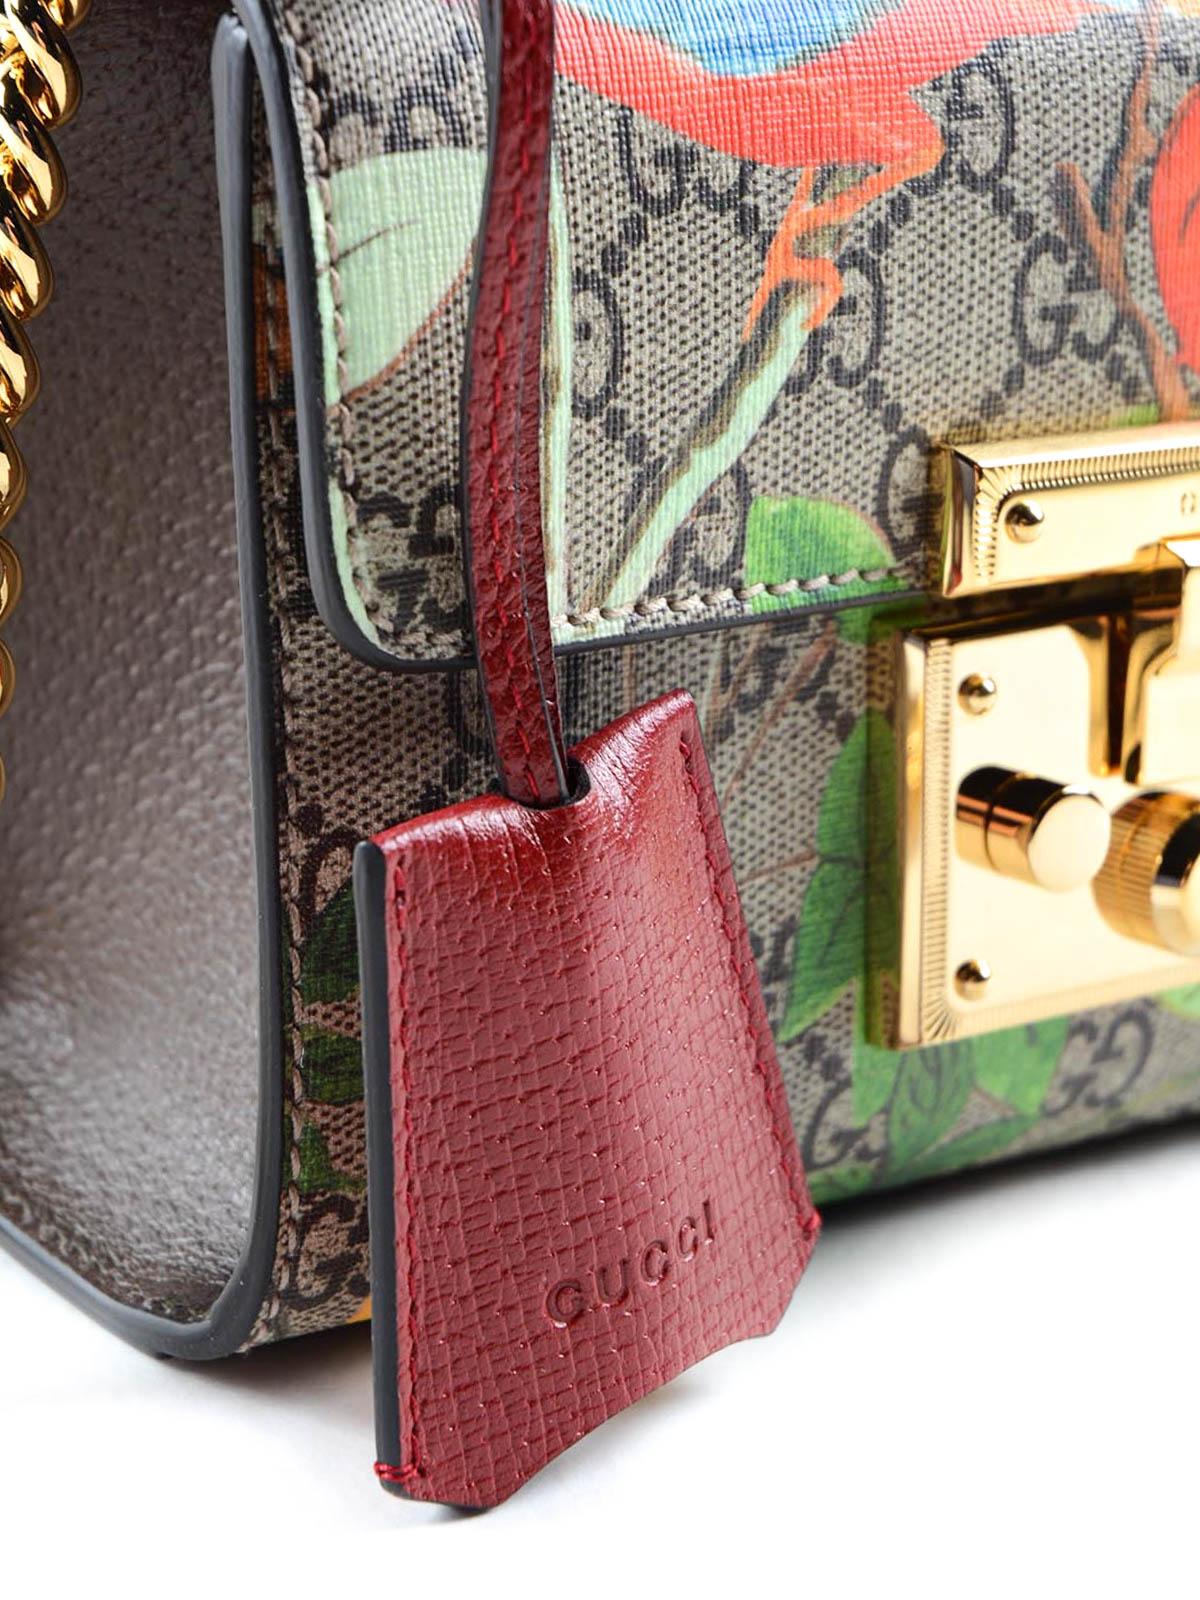 30bd441772c Gucci - GG Supreme Tian padlock bag - shoulder bags - 409487K0L5G 8682